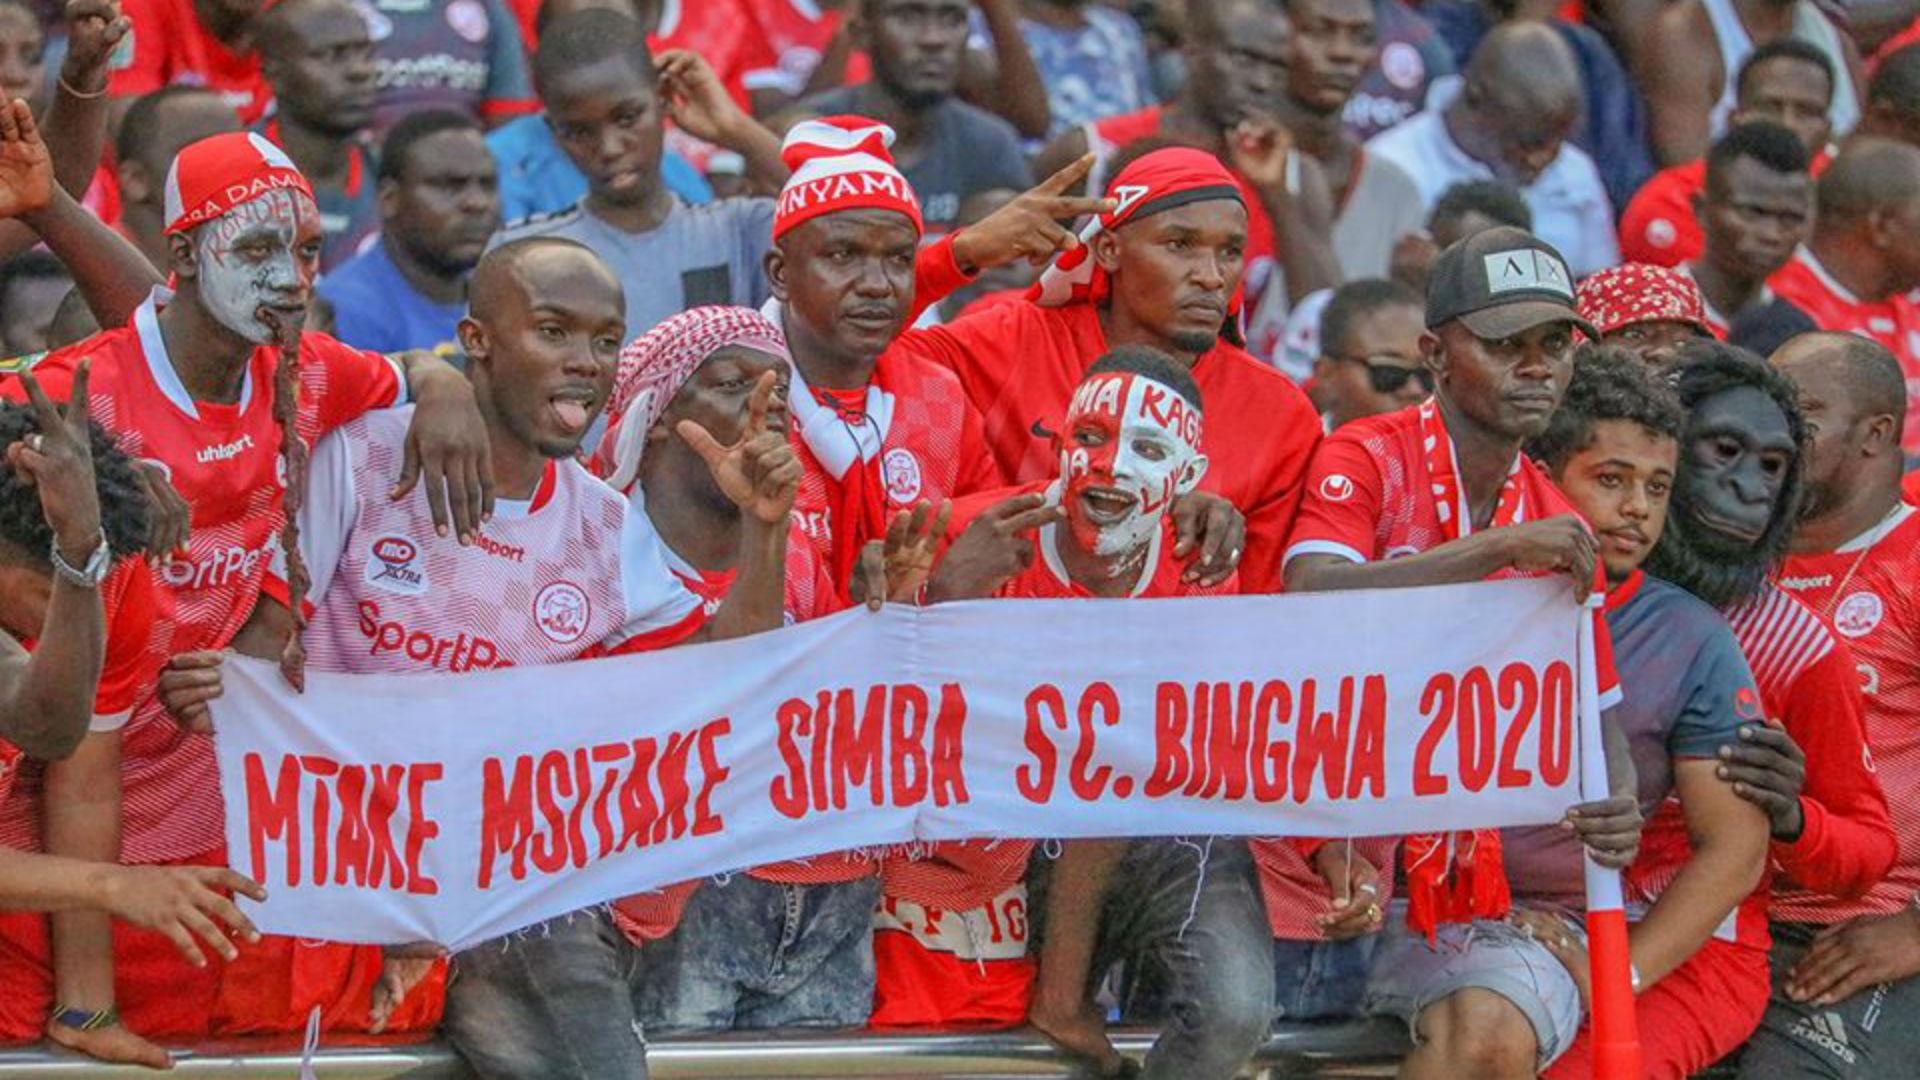 Caf celebrates Simba SC comeback record in club history